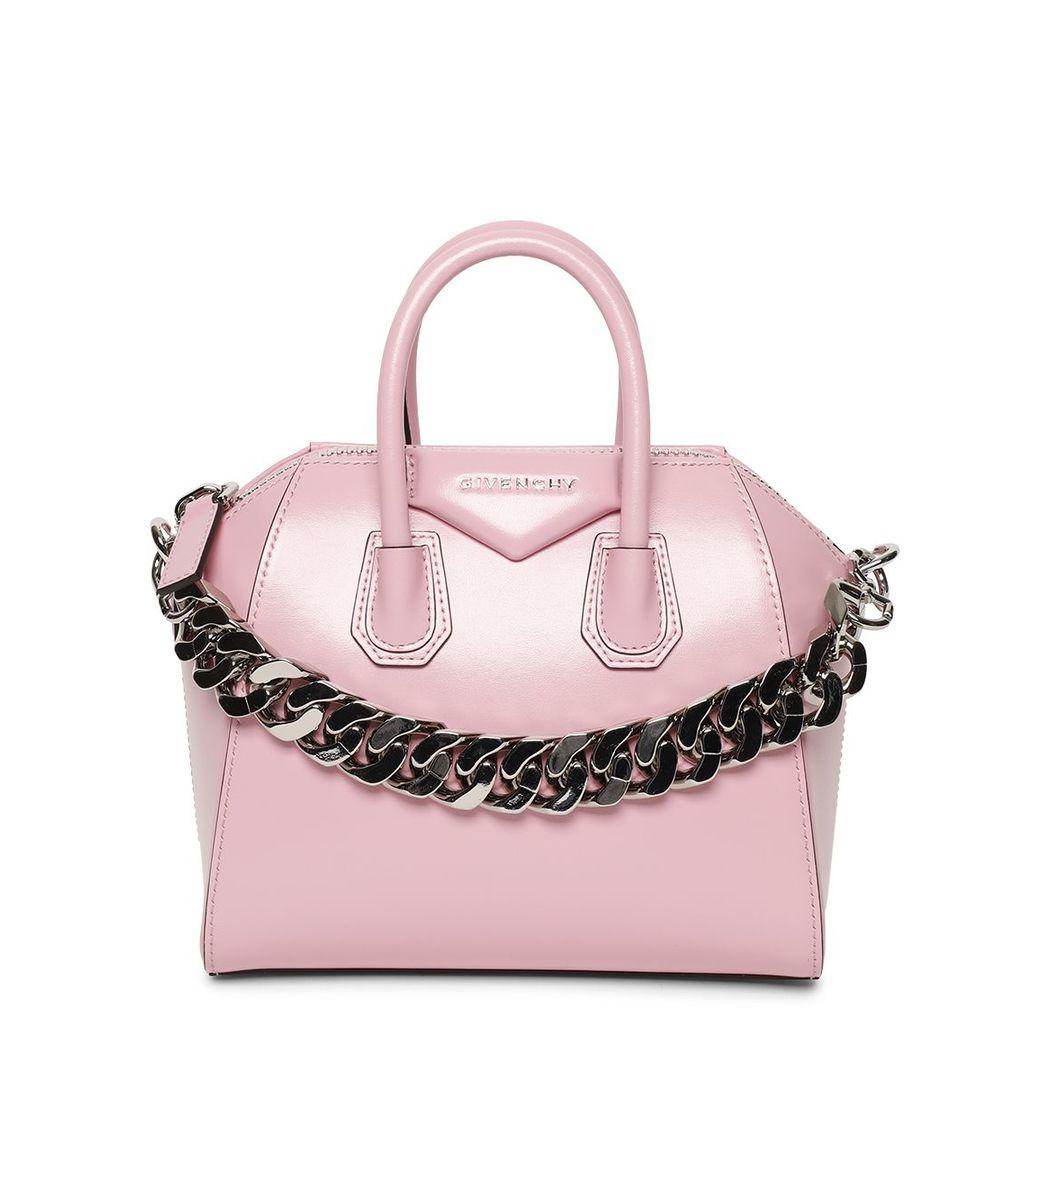 Givenchy Leathers Antigona Mini Bag, Baby Pink